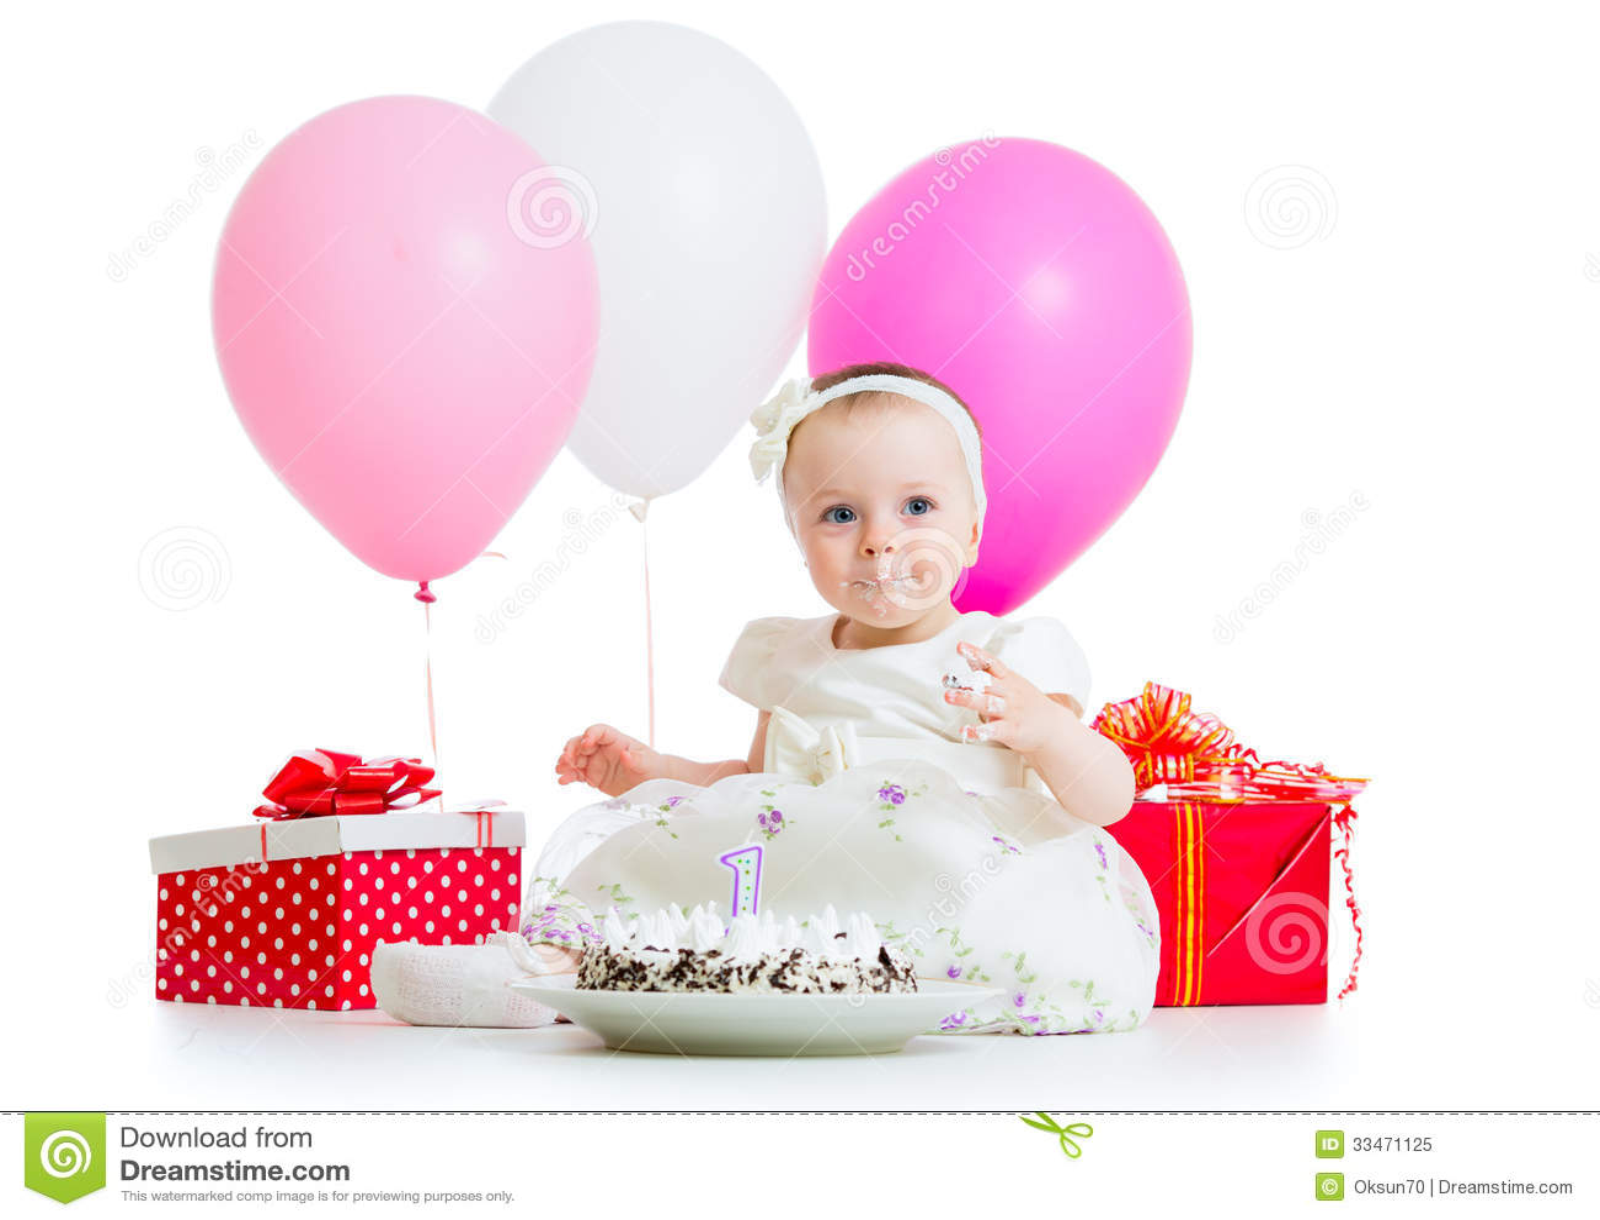 baby girl eating birthday cake royalty free stock photo image on images baby eating birthday cake